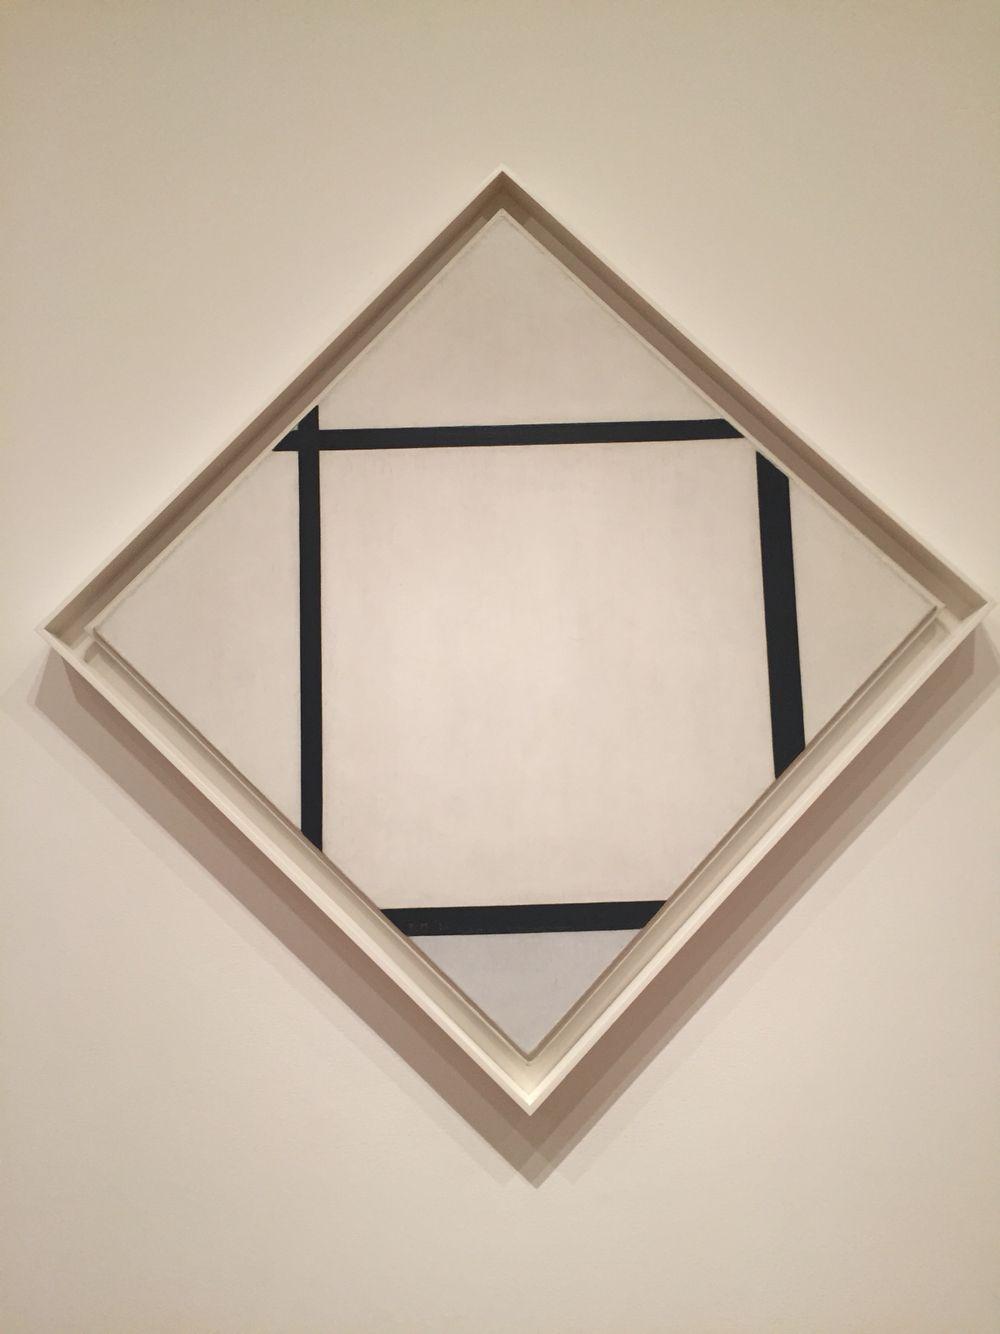 Tableau I Lozenge With Four Lines And Gray Piet Mondrian Museum Of Modern Art Piet Mondrian Piet